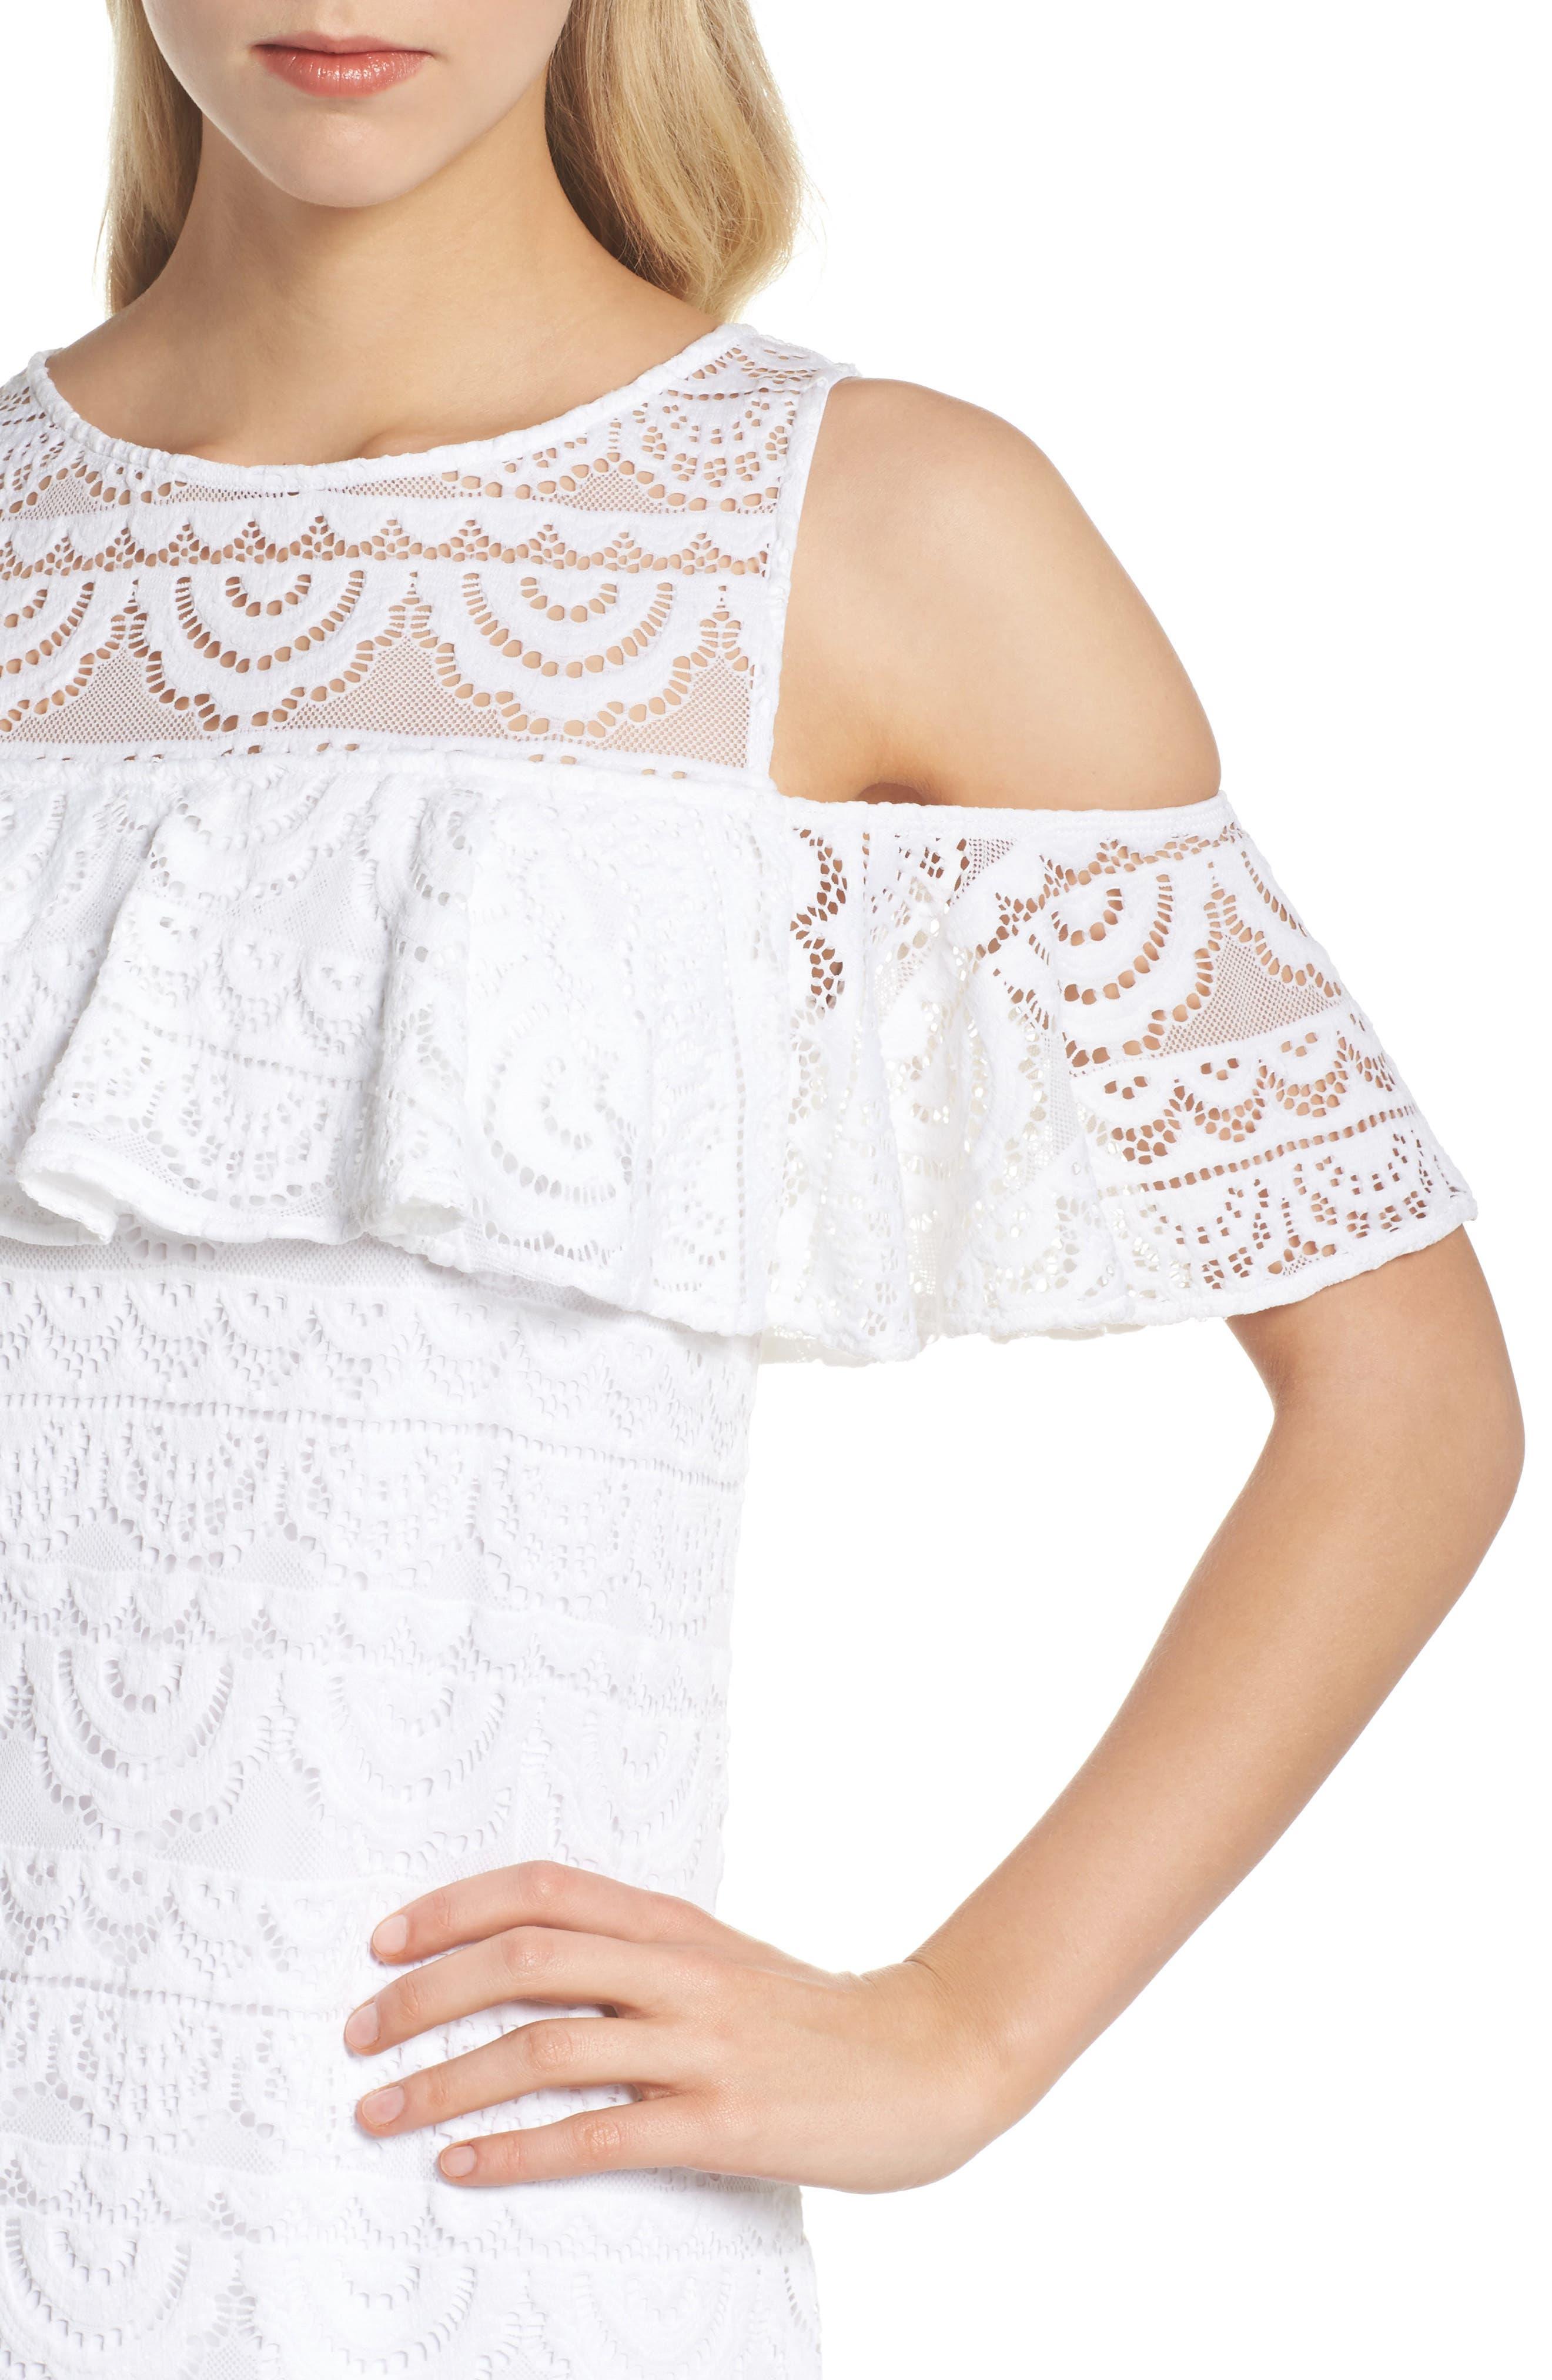 Lyra Cold Shoulder Lace Dress,                             Alternate thumbnail 4, color,                             Resort White Scallop Lace